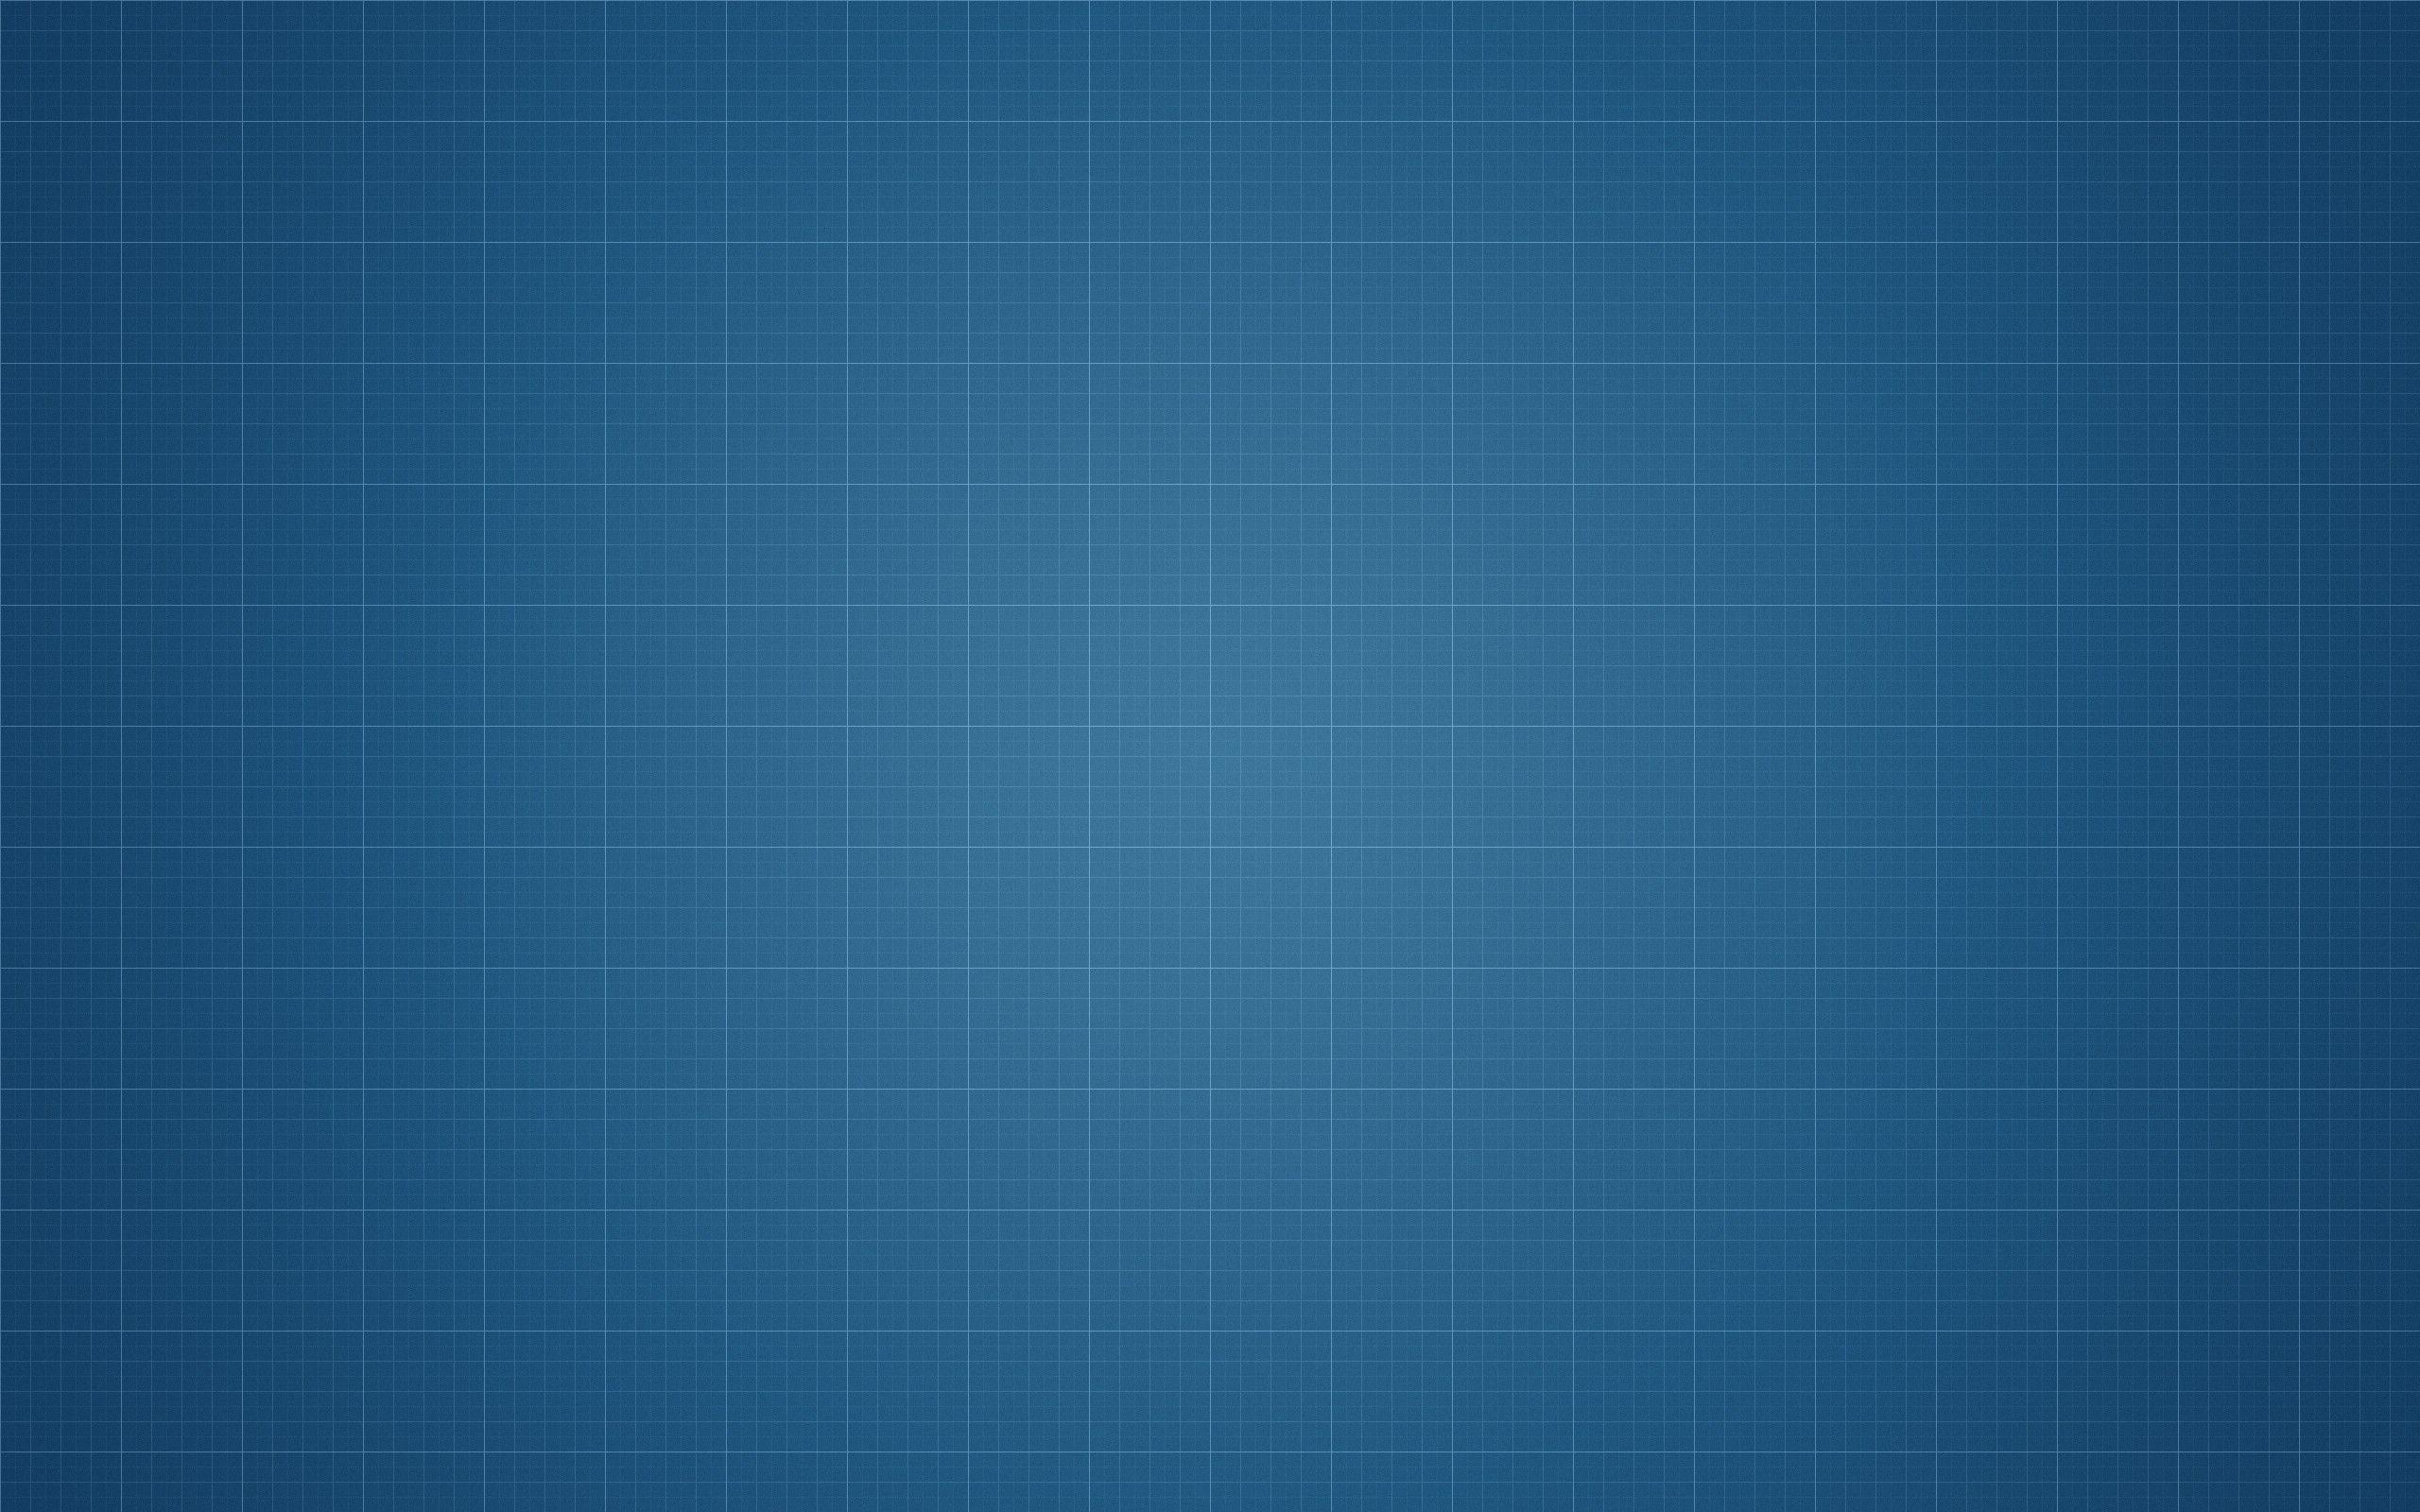 Blueprint Clear Paper 2560x1600